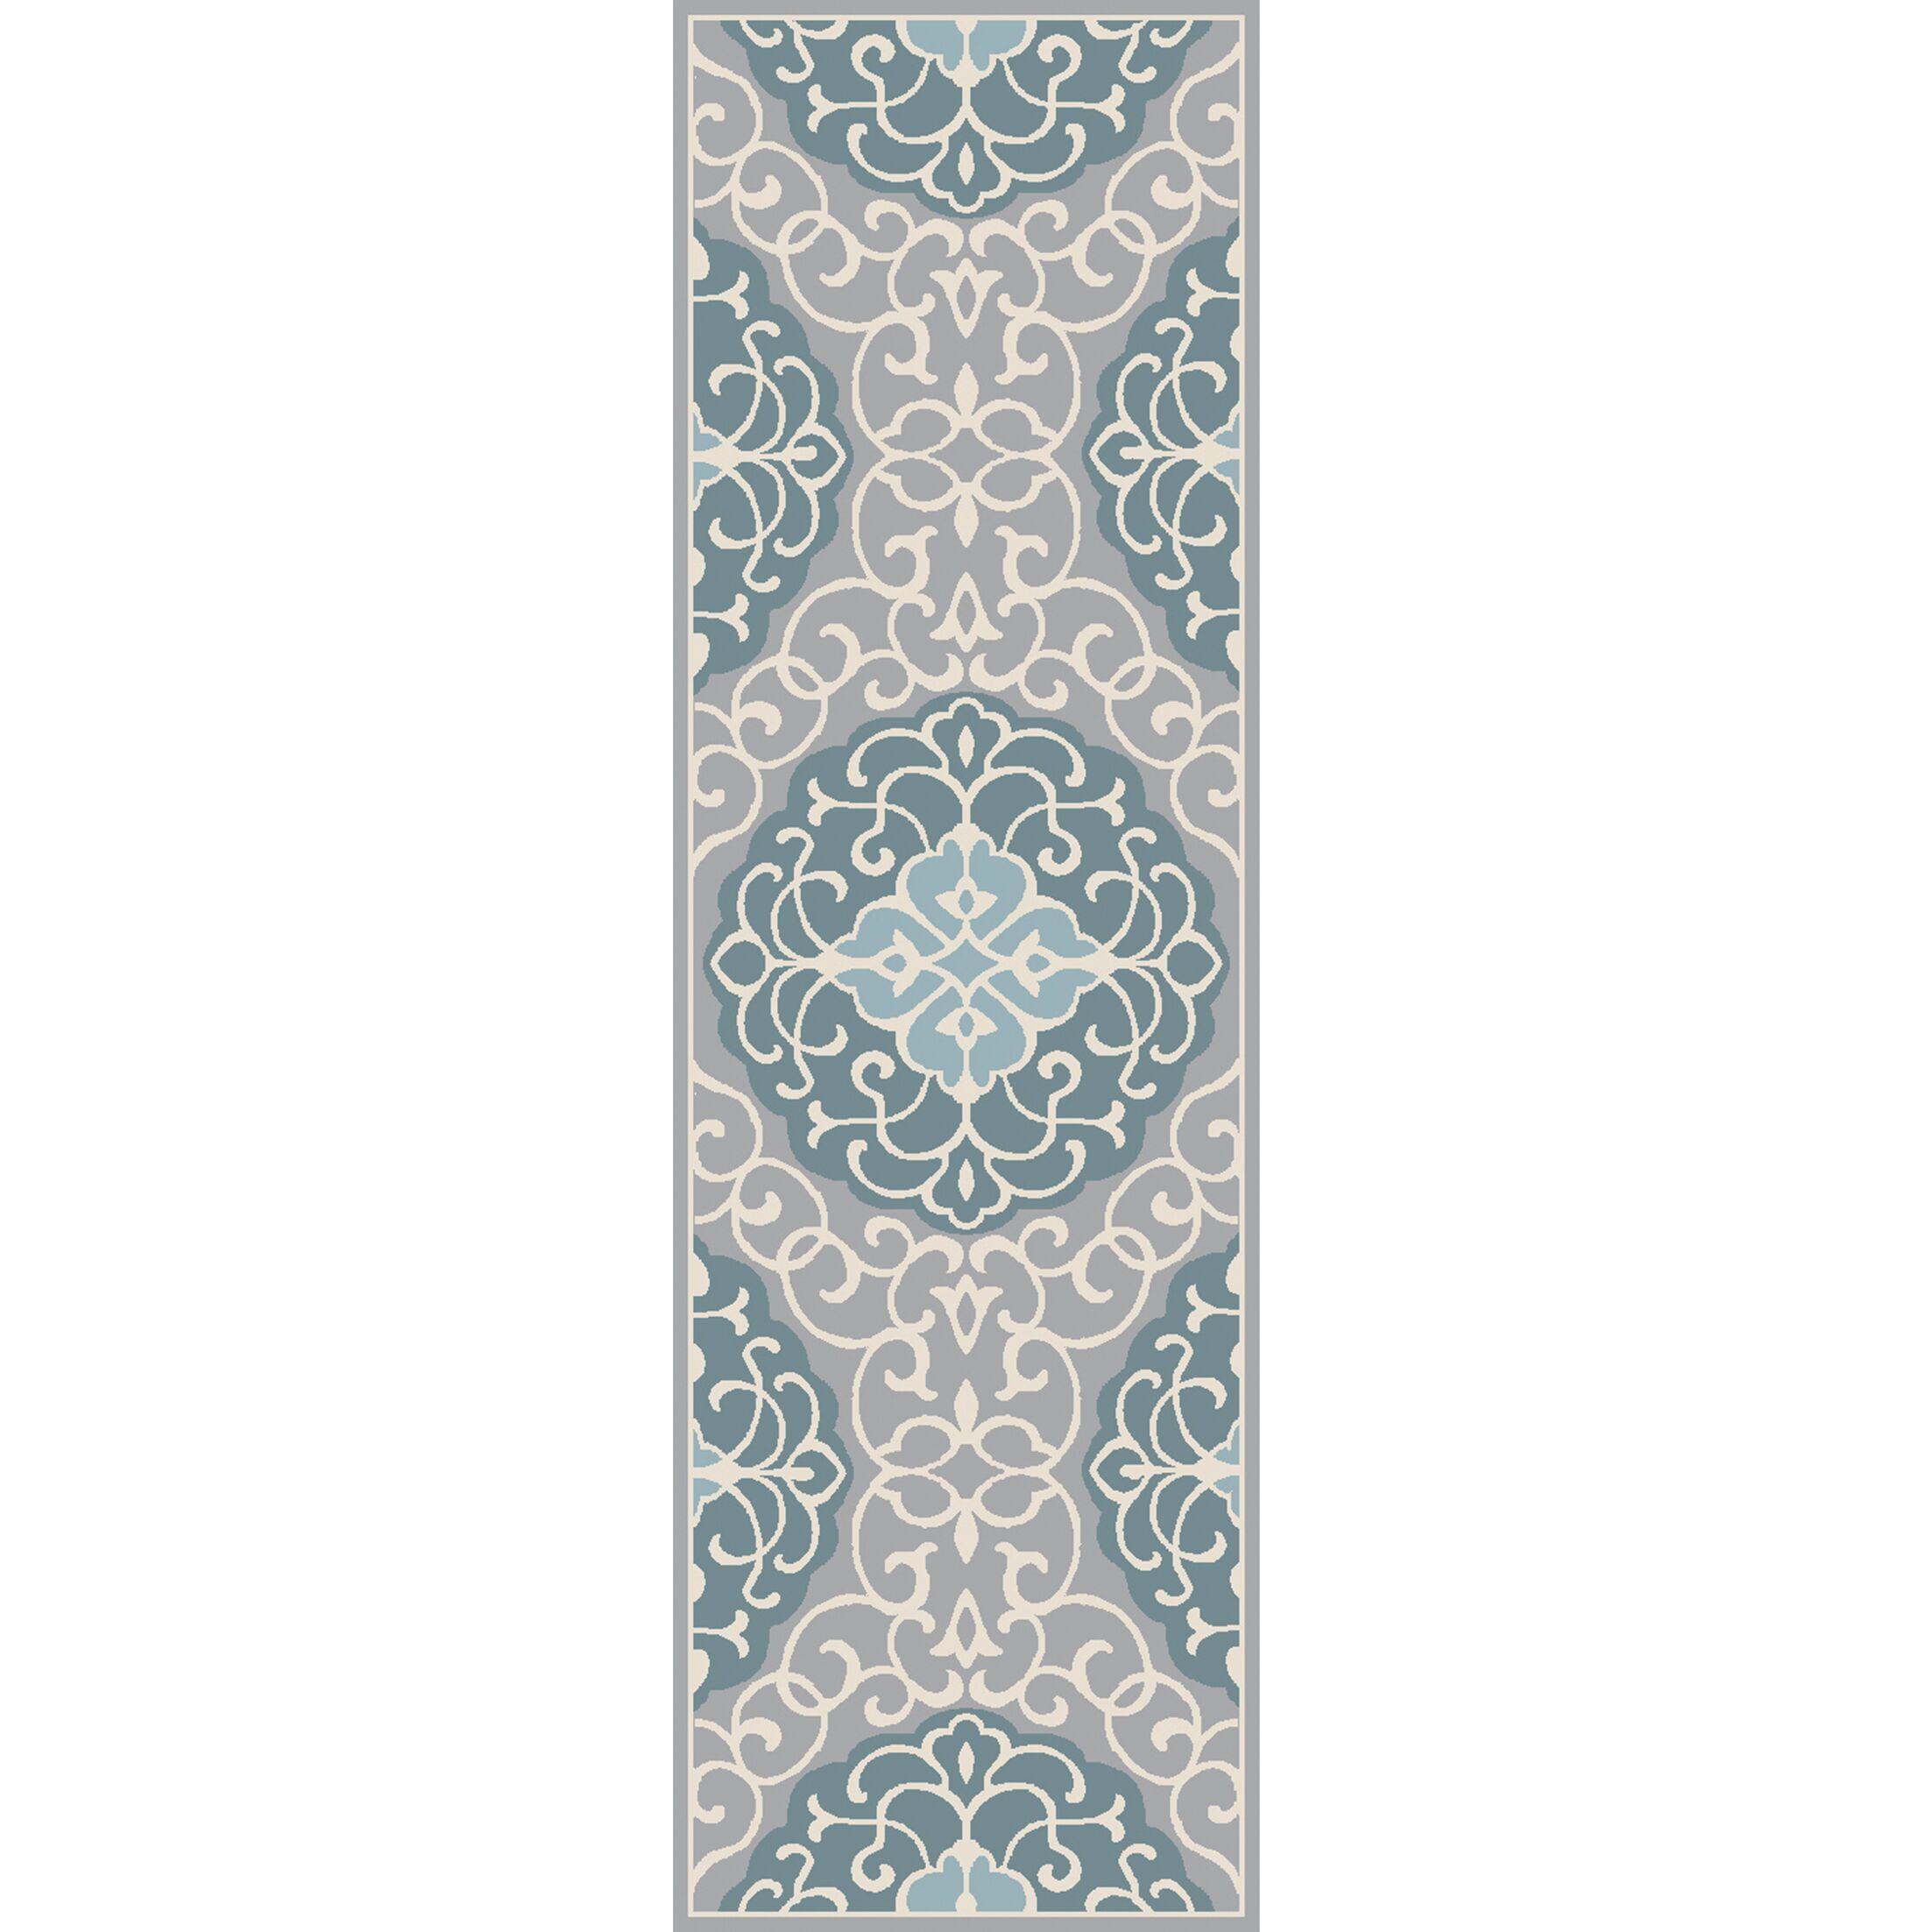 Windsor Hand-Tufted Aqua/Light Gray Area Rug Rug Size: Rectangle 3'6